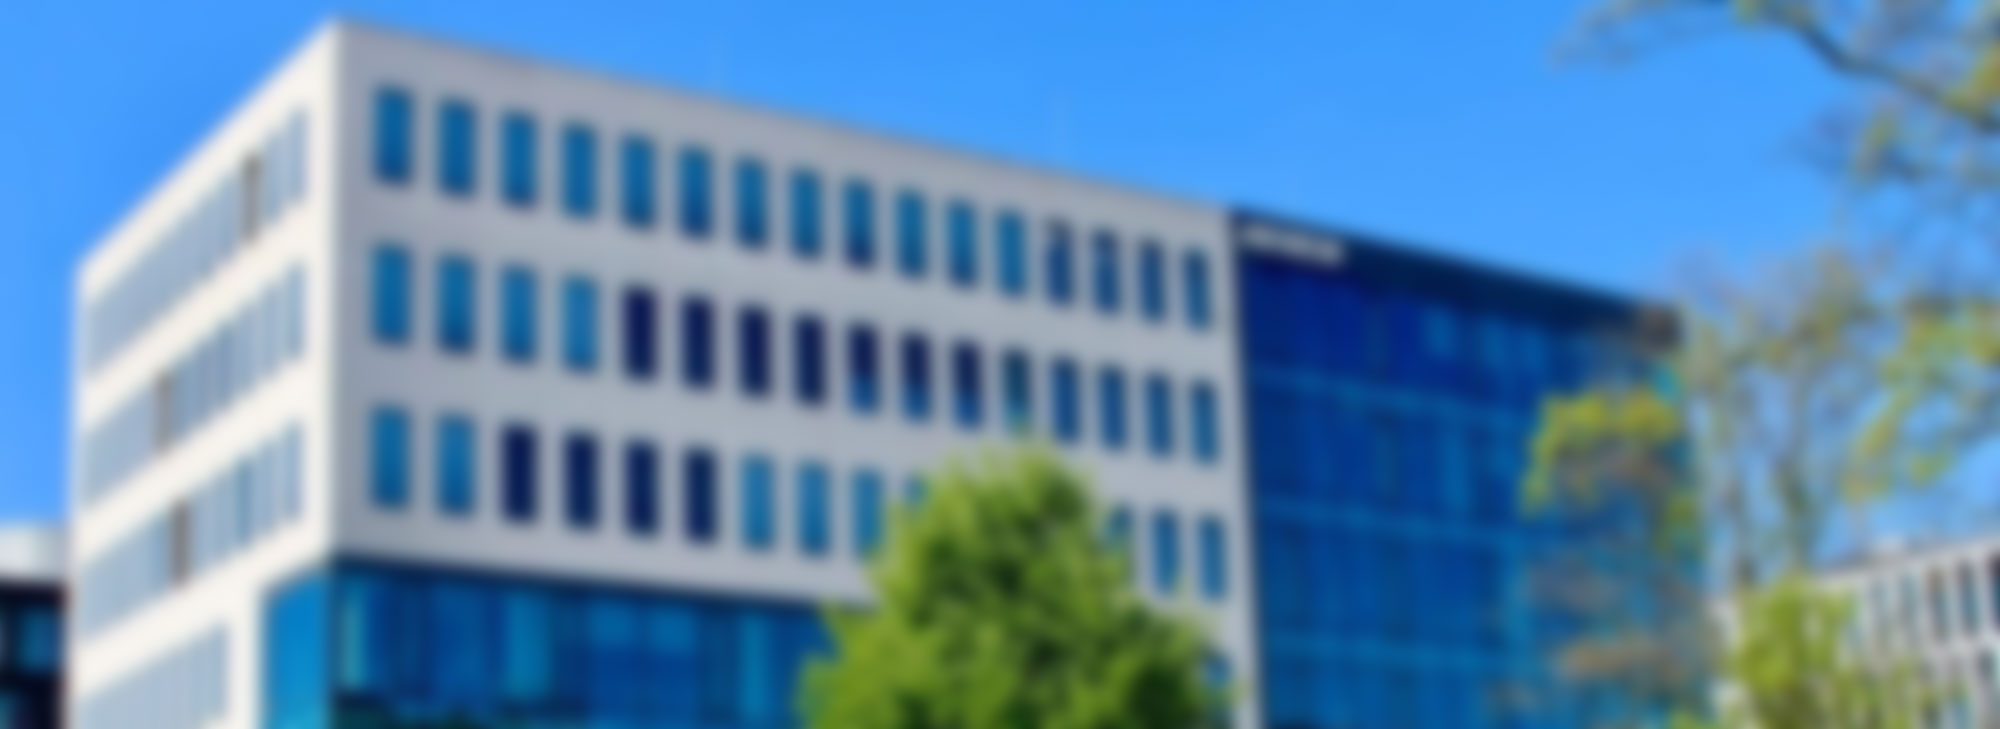 Investors-header-blur